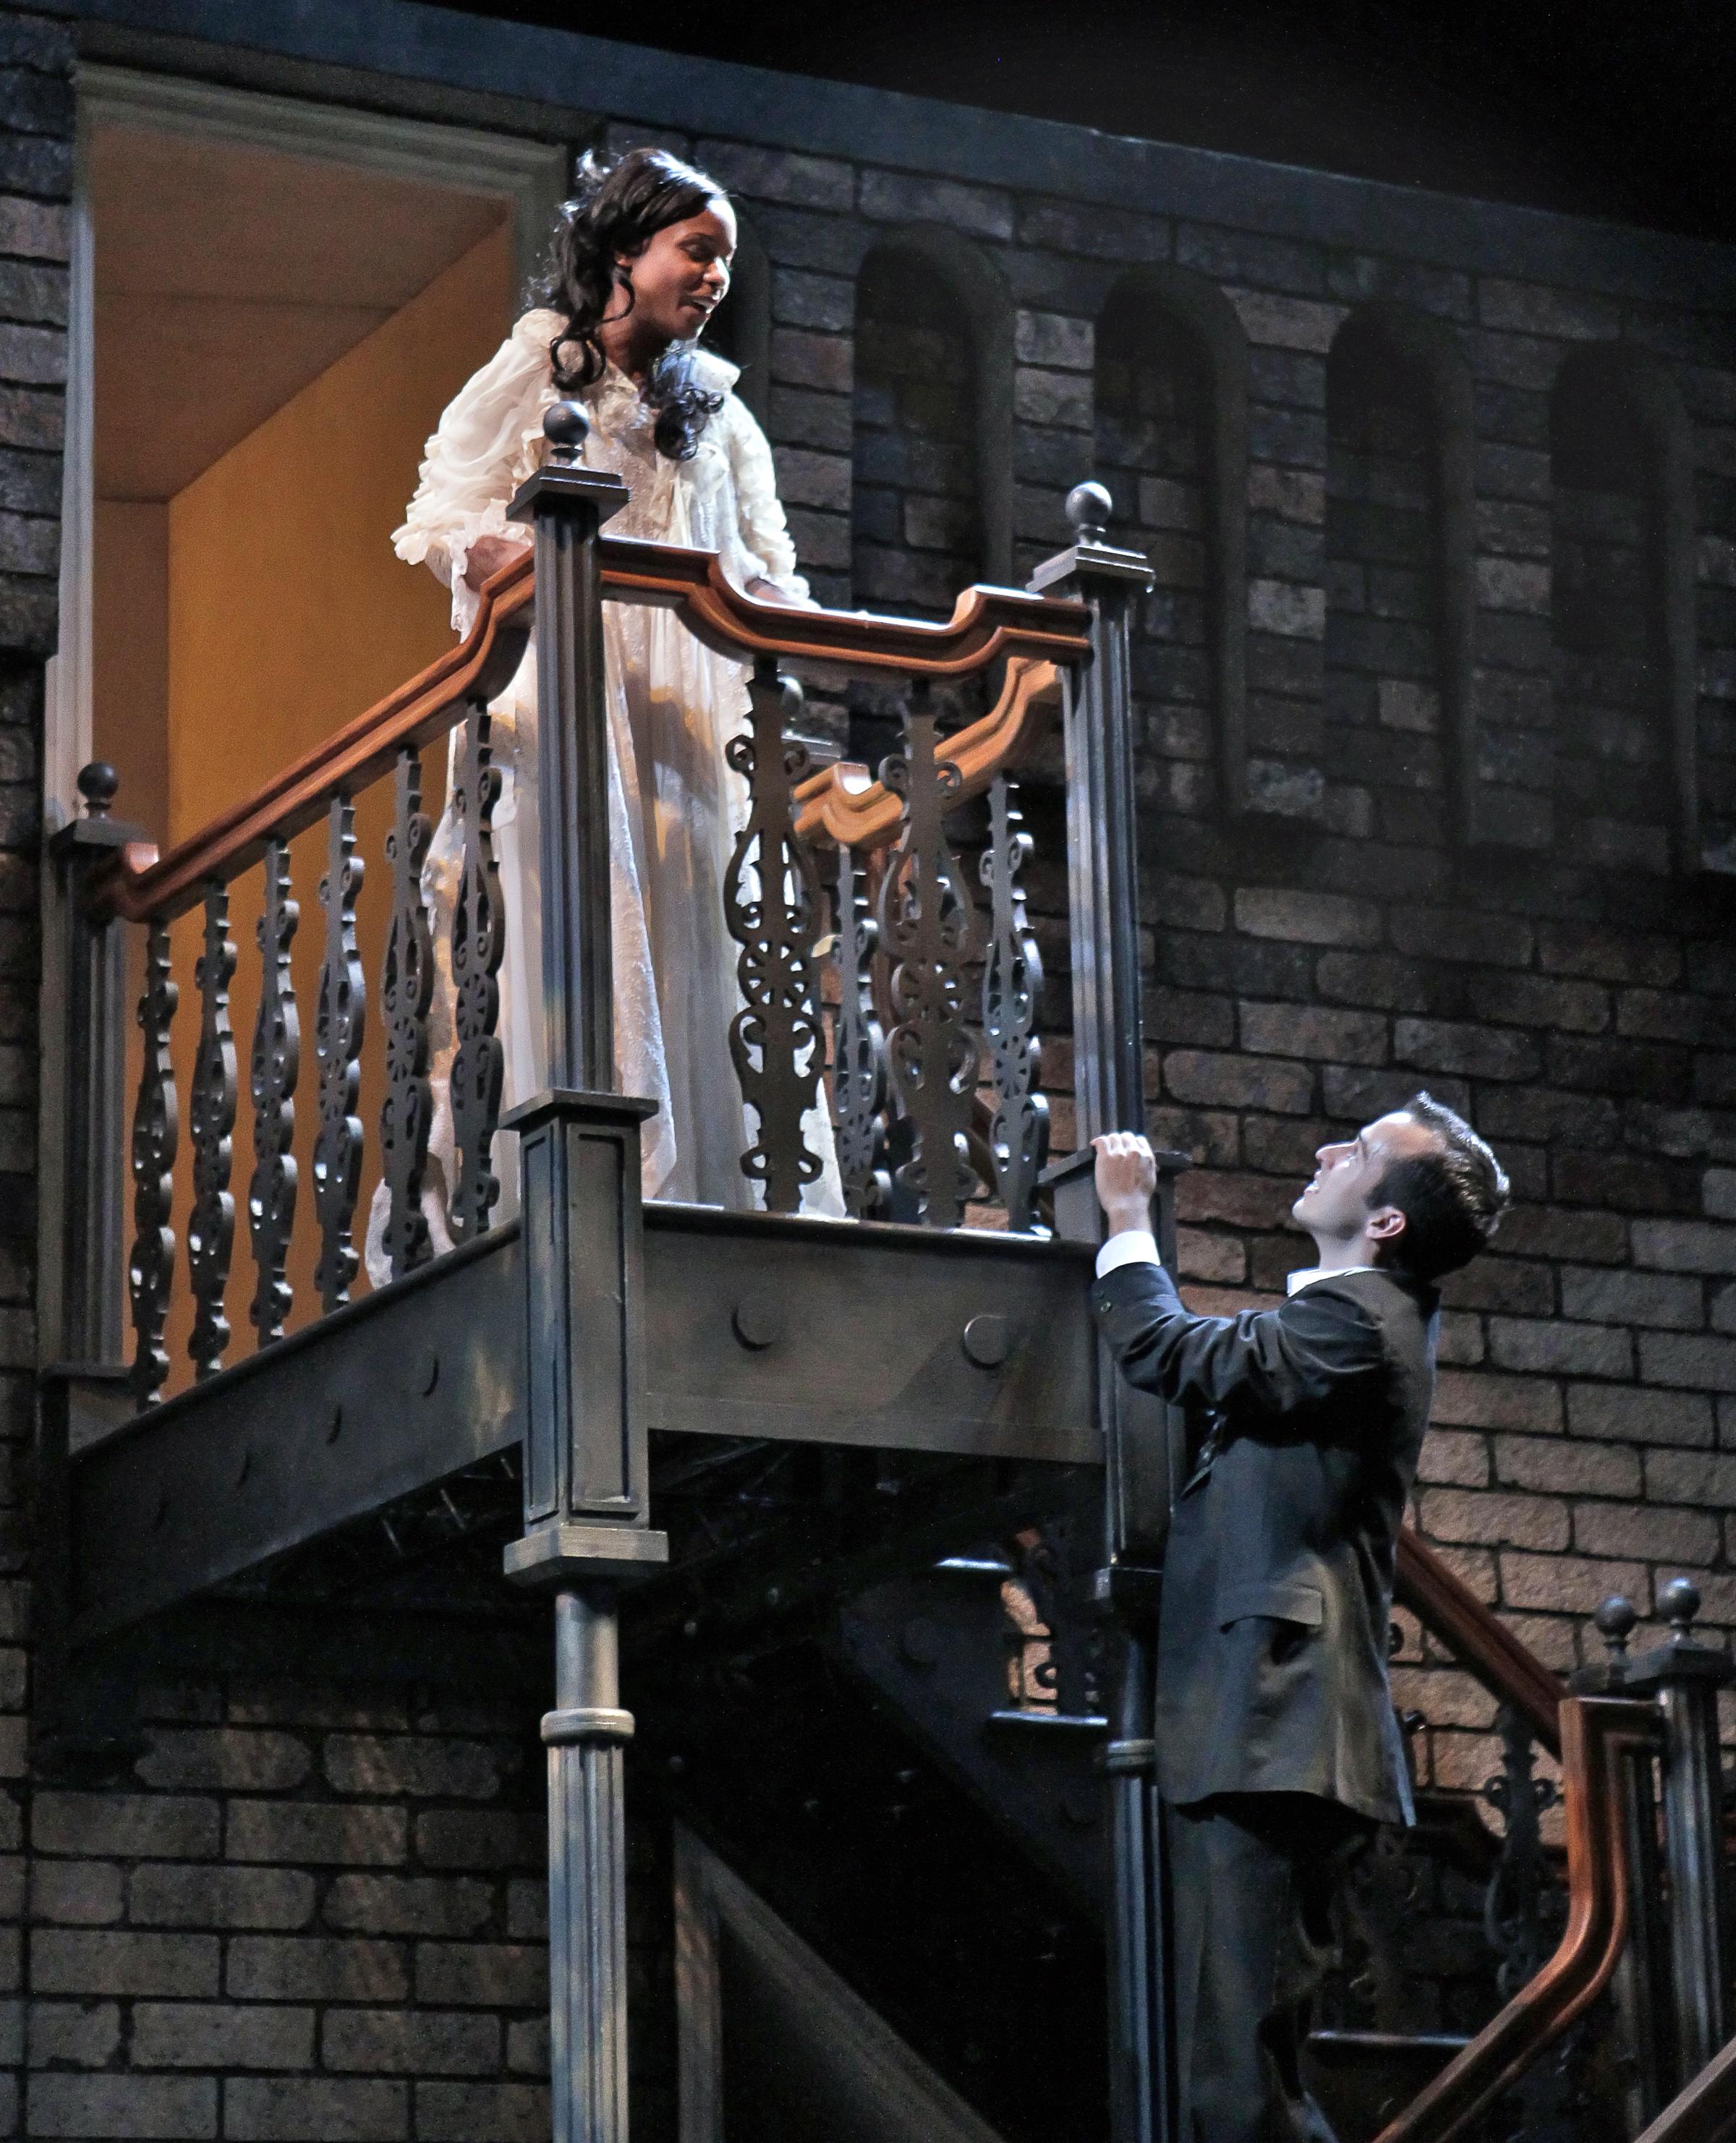 Romeo balcony scene - dcbulo.com.